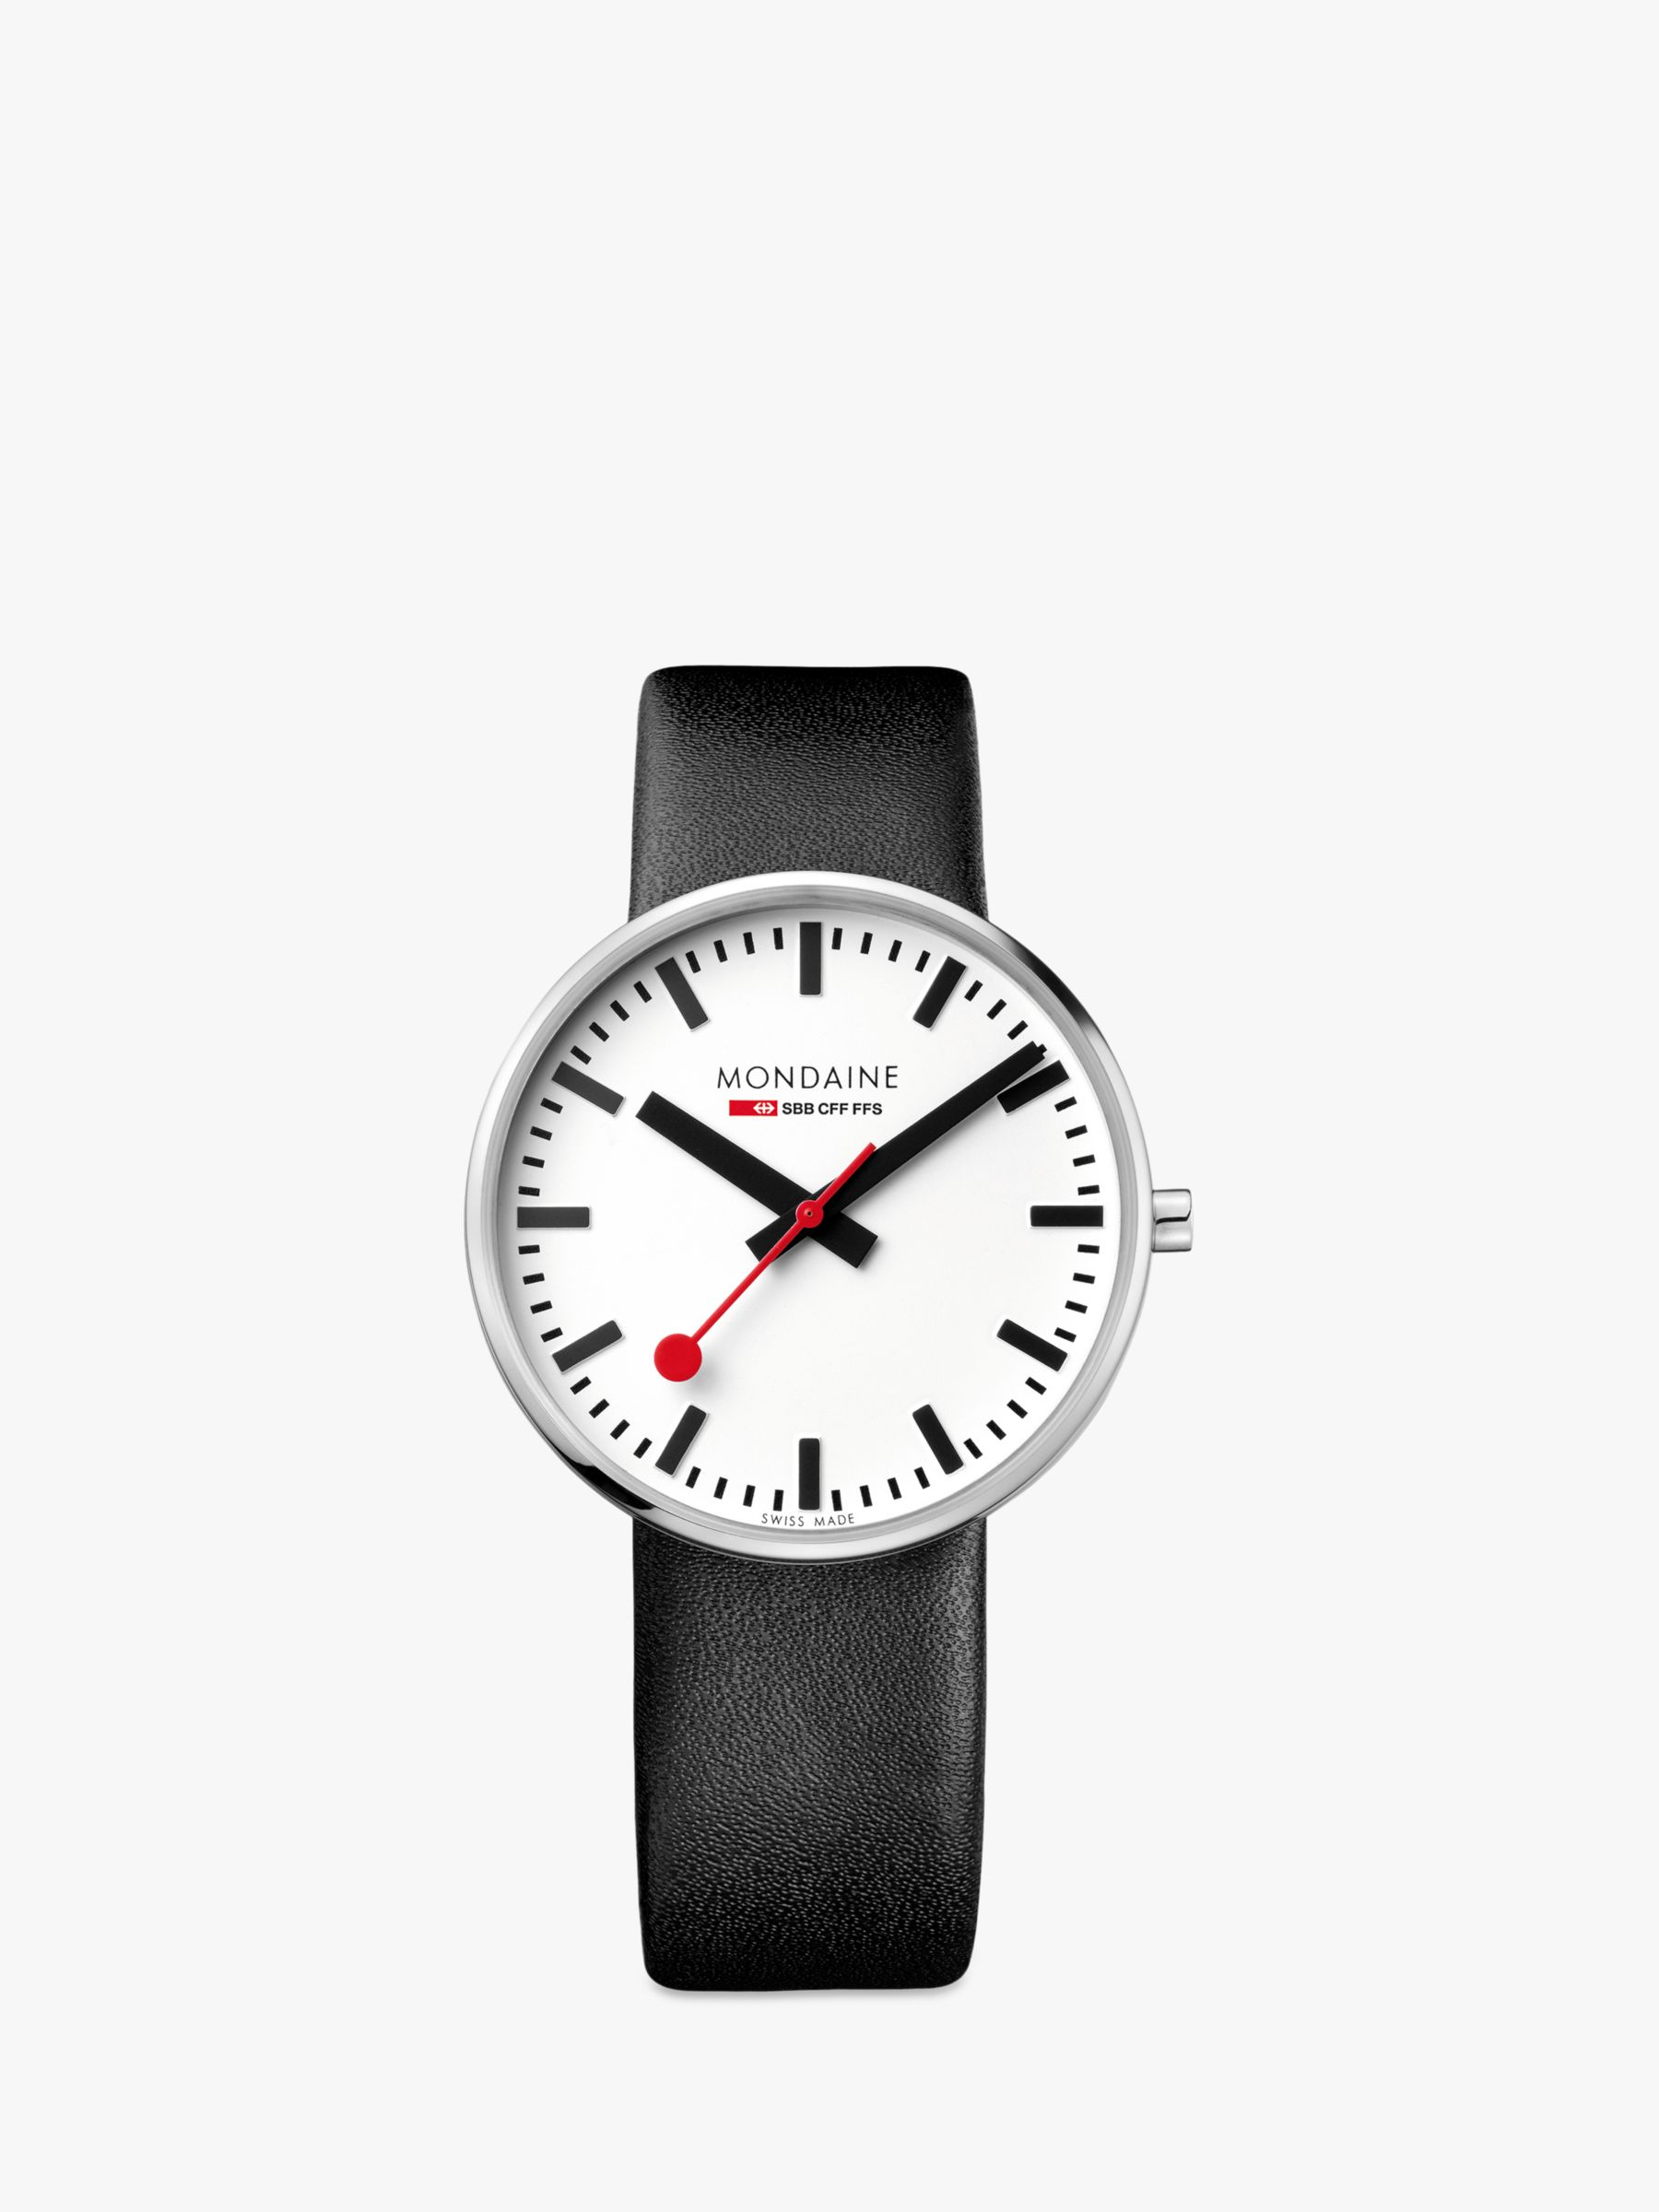 Mondaine Mondaine MSX.4211B.LB Unisex SBB Classic Leather Strap Watch, Black/White